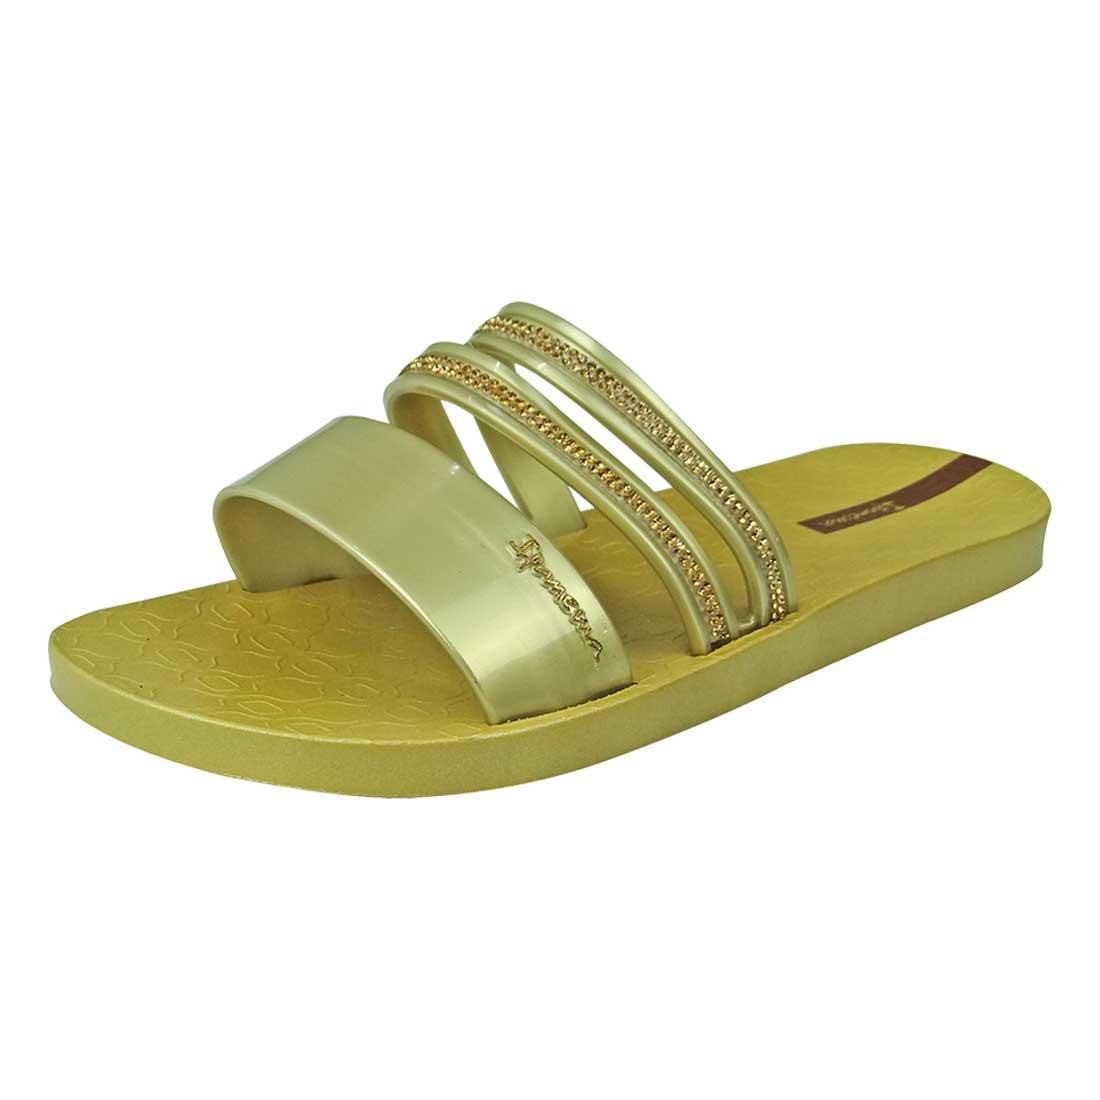 Ipanema New Glam - Ouro